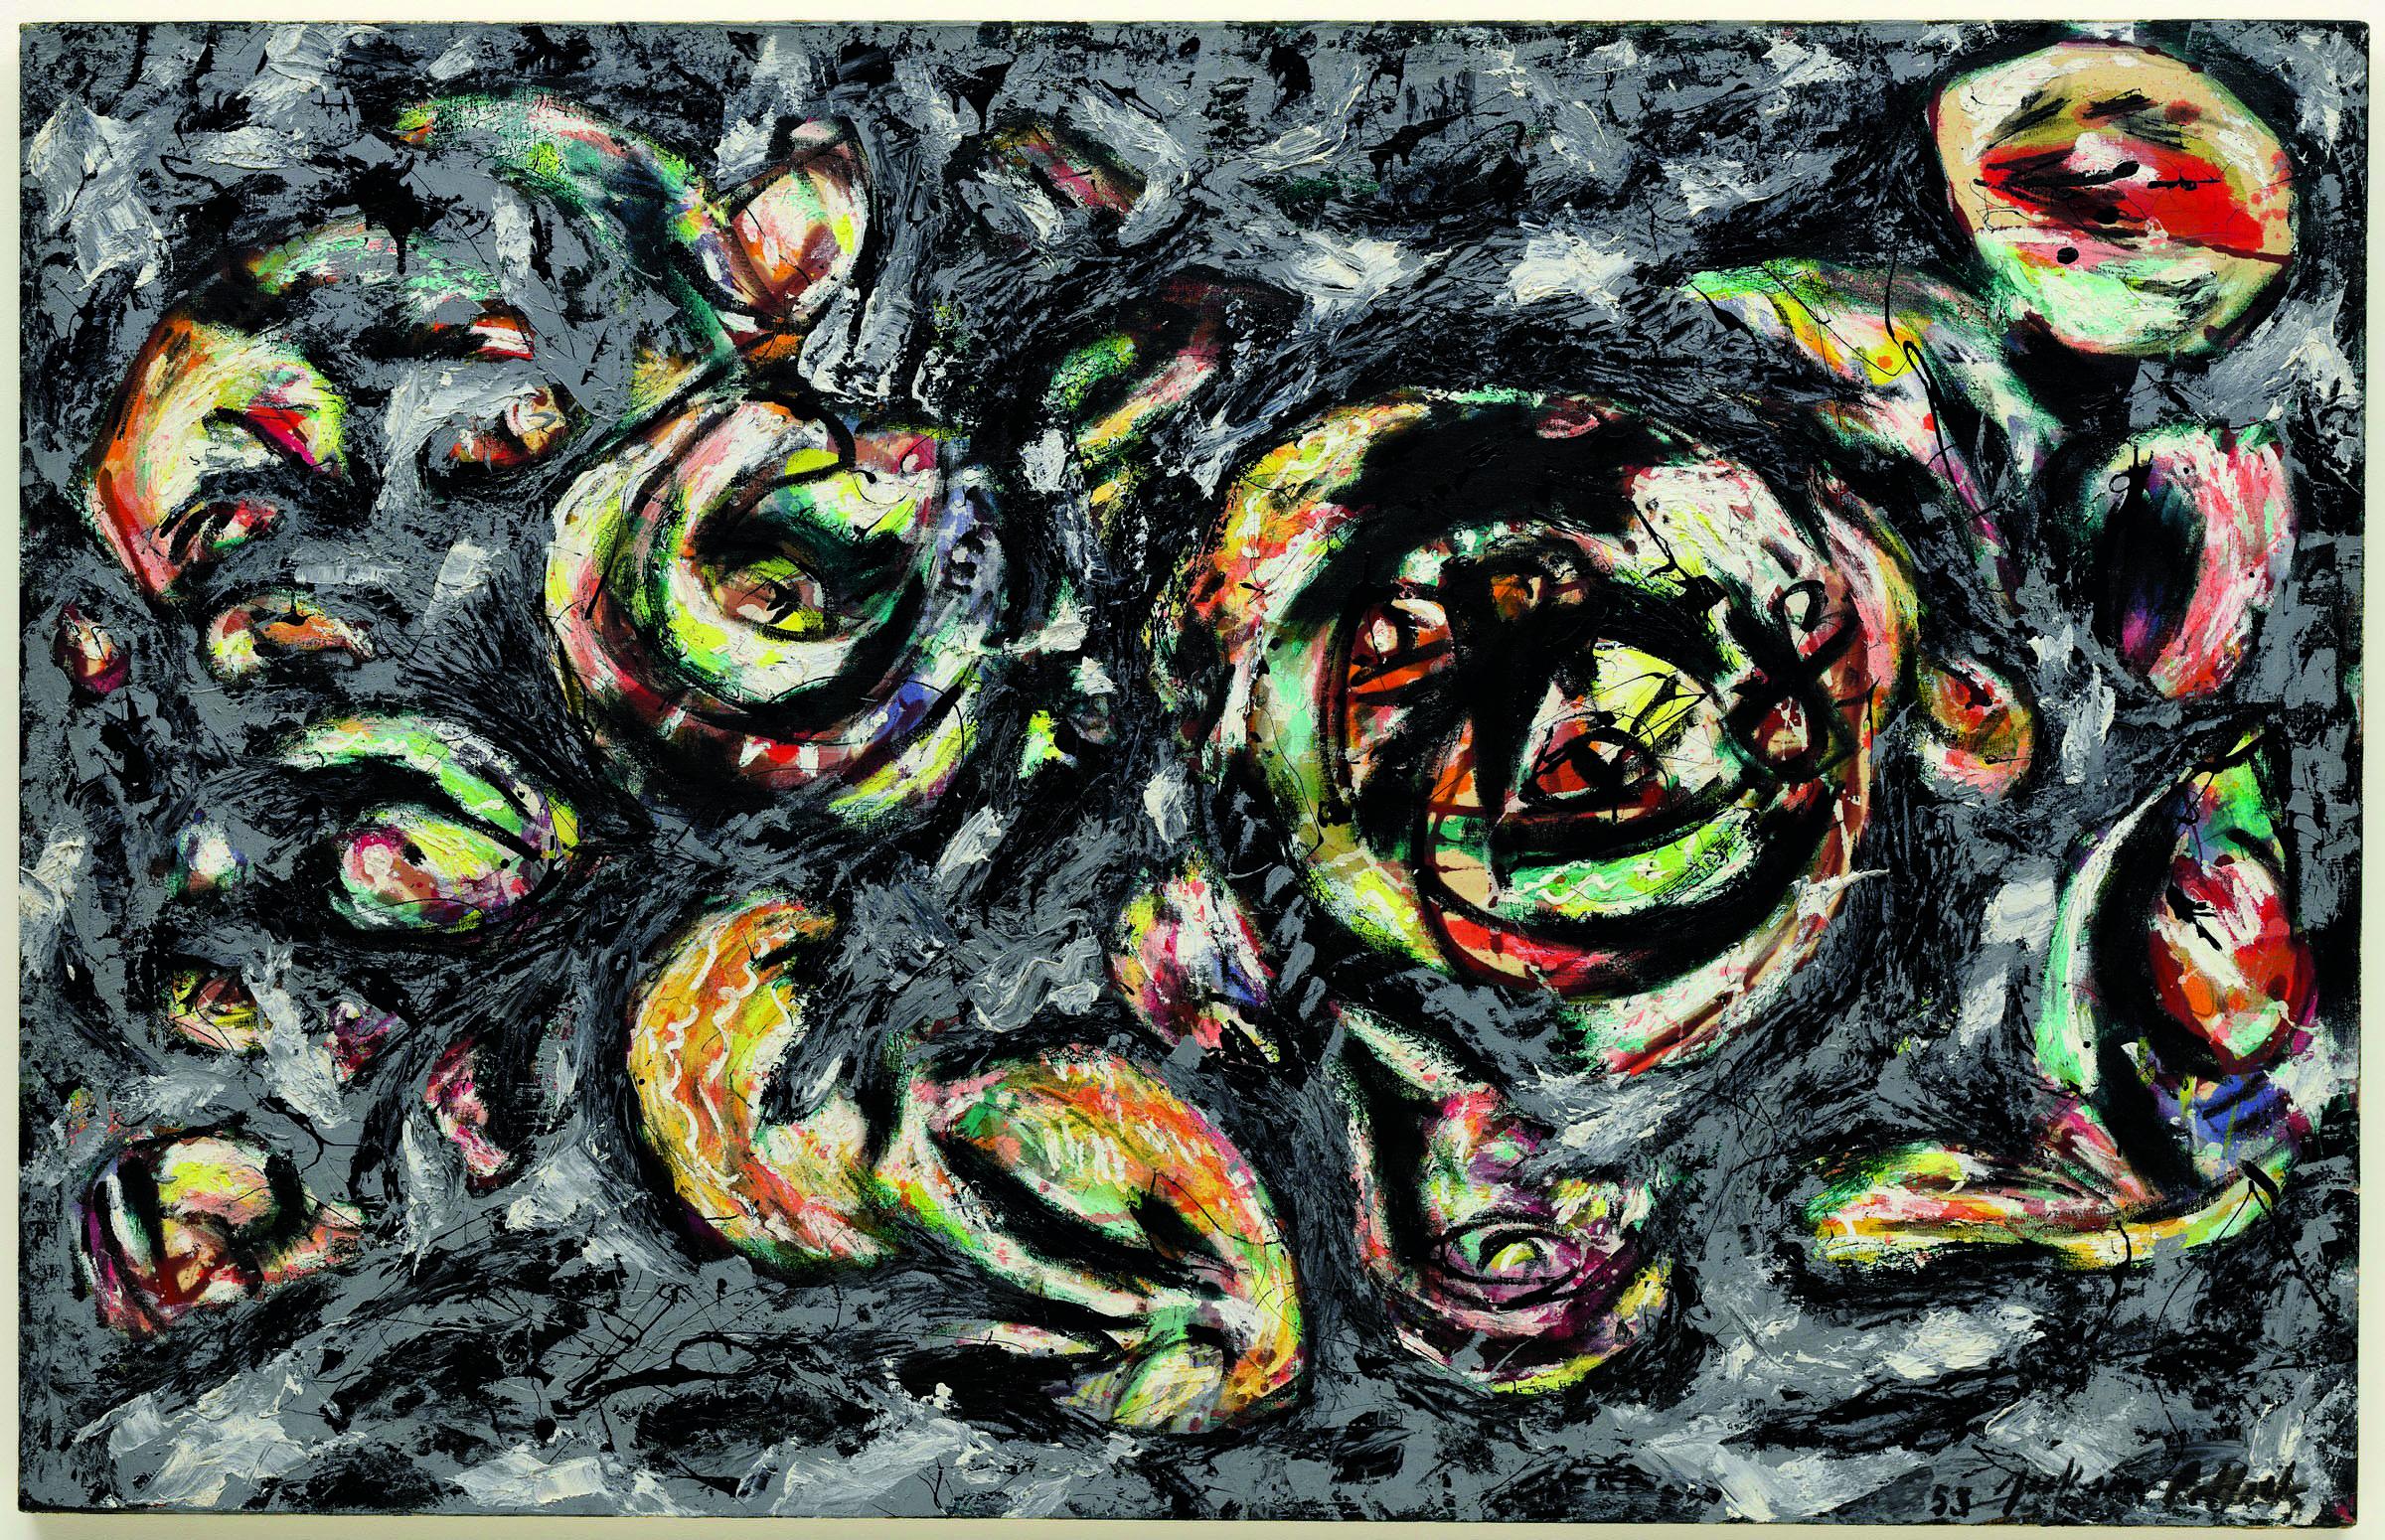 Abstract Art Between The Wars